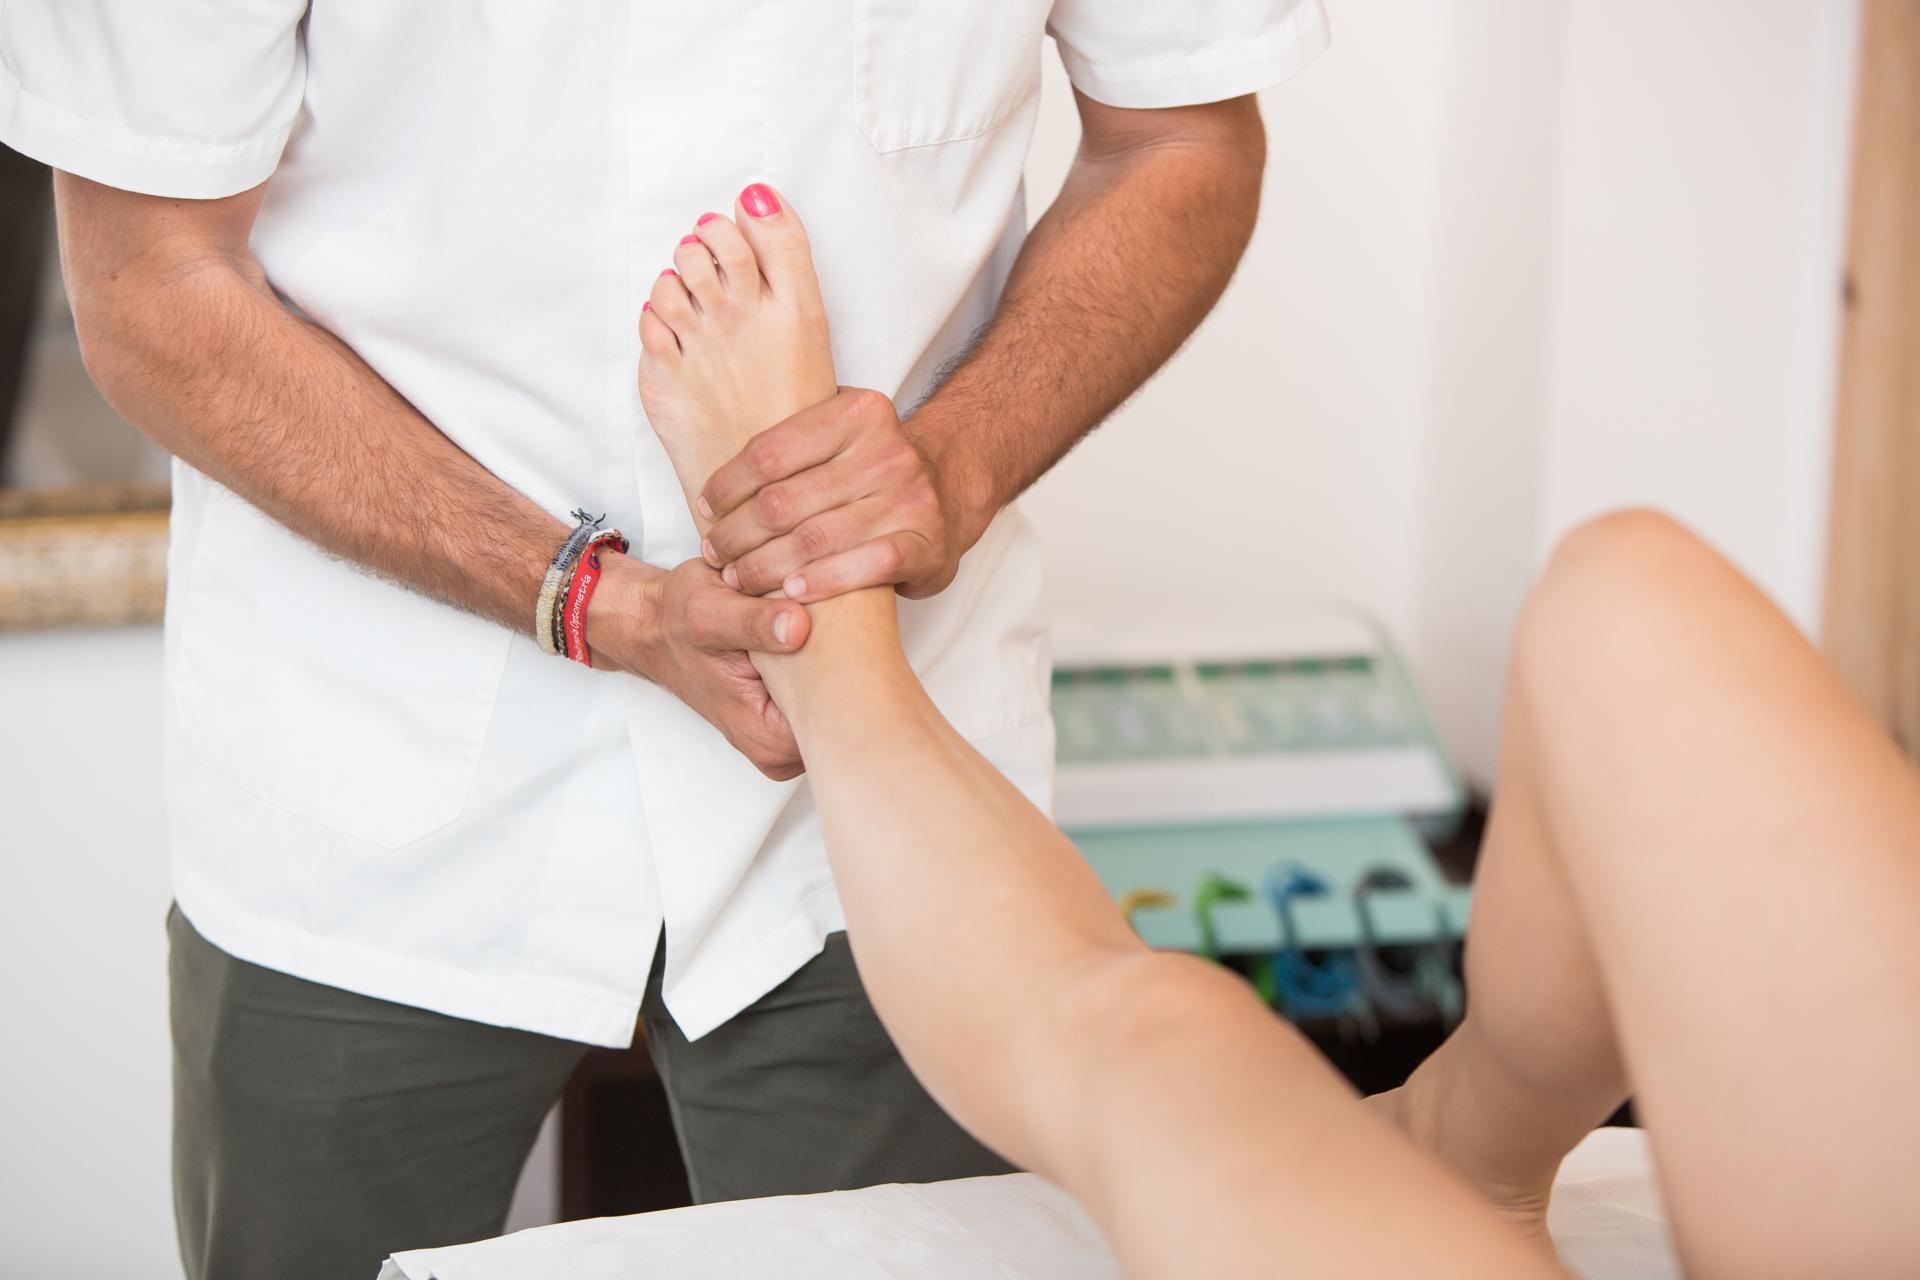 Centro Osteopatía - Sant Cugat